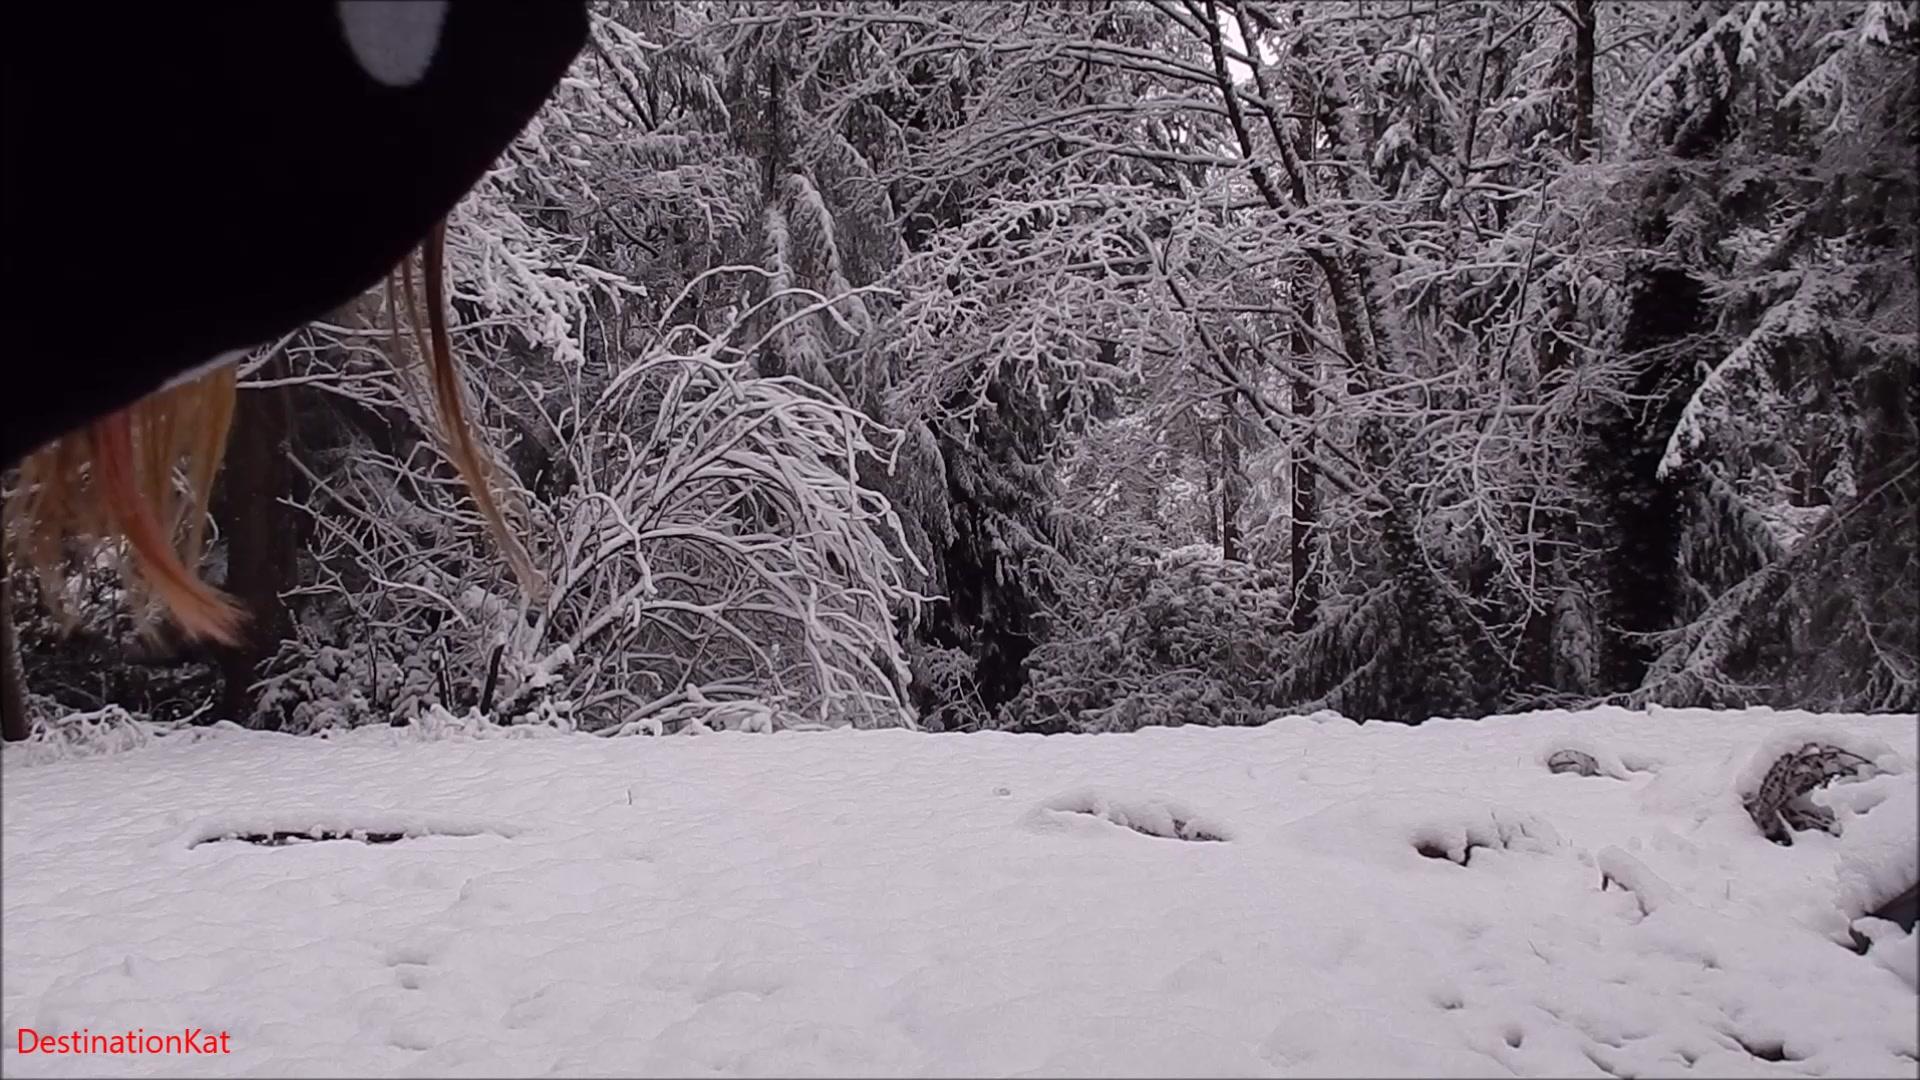 Destinationkat - Colored Snow